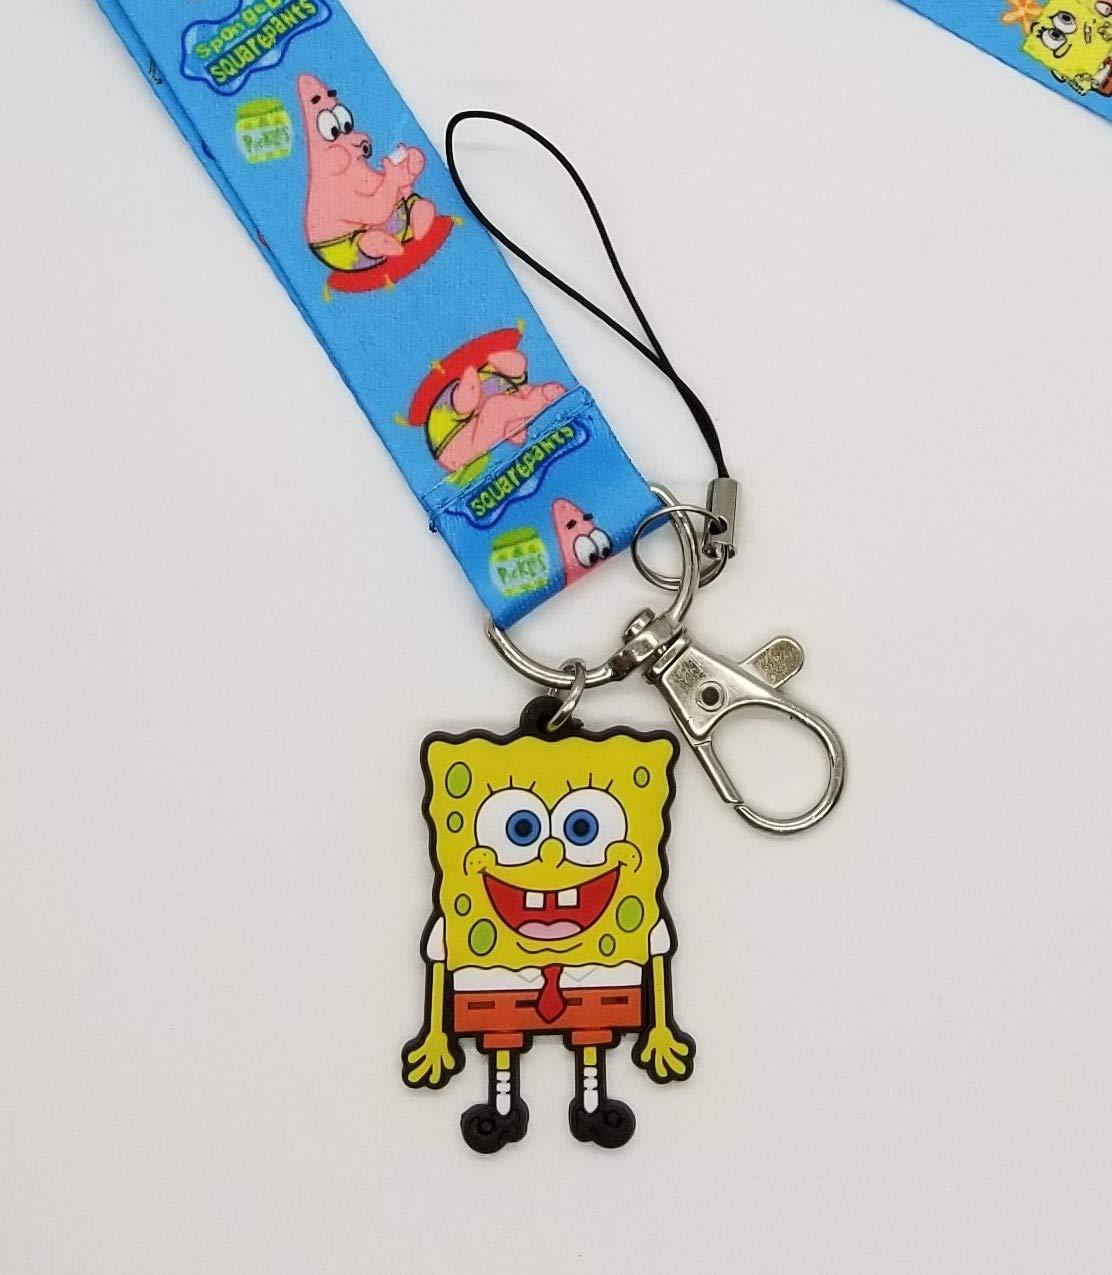 Spongebob Lanyard Stainless Steel D Ring Handmade Cell Phone Lanyard